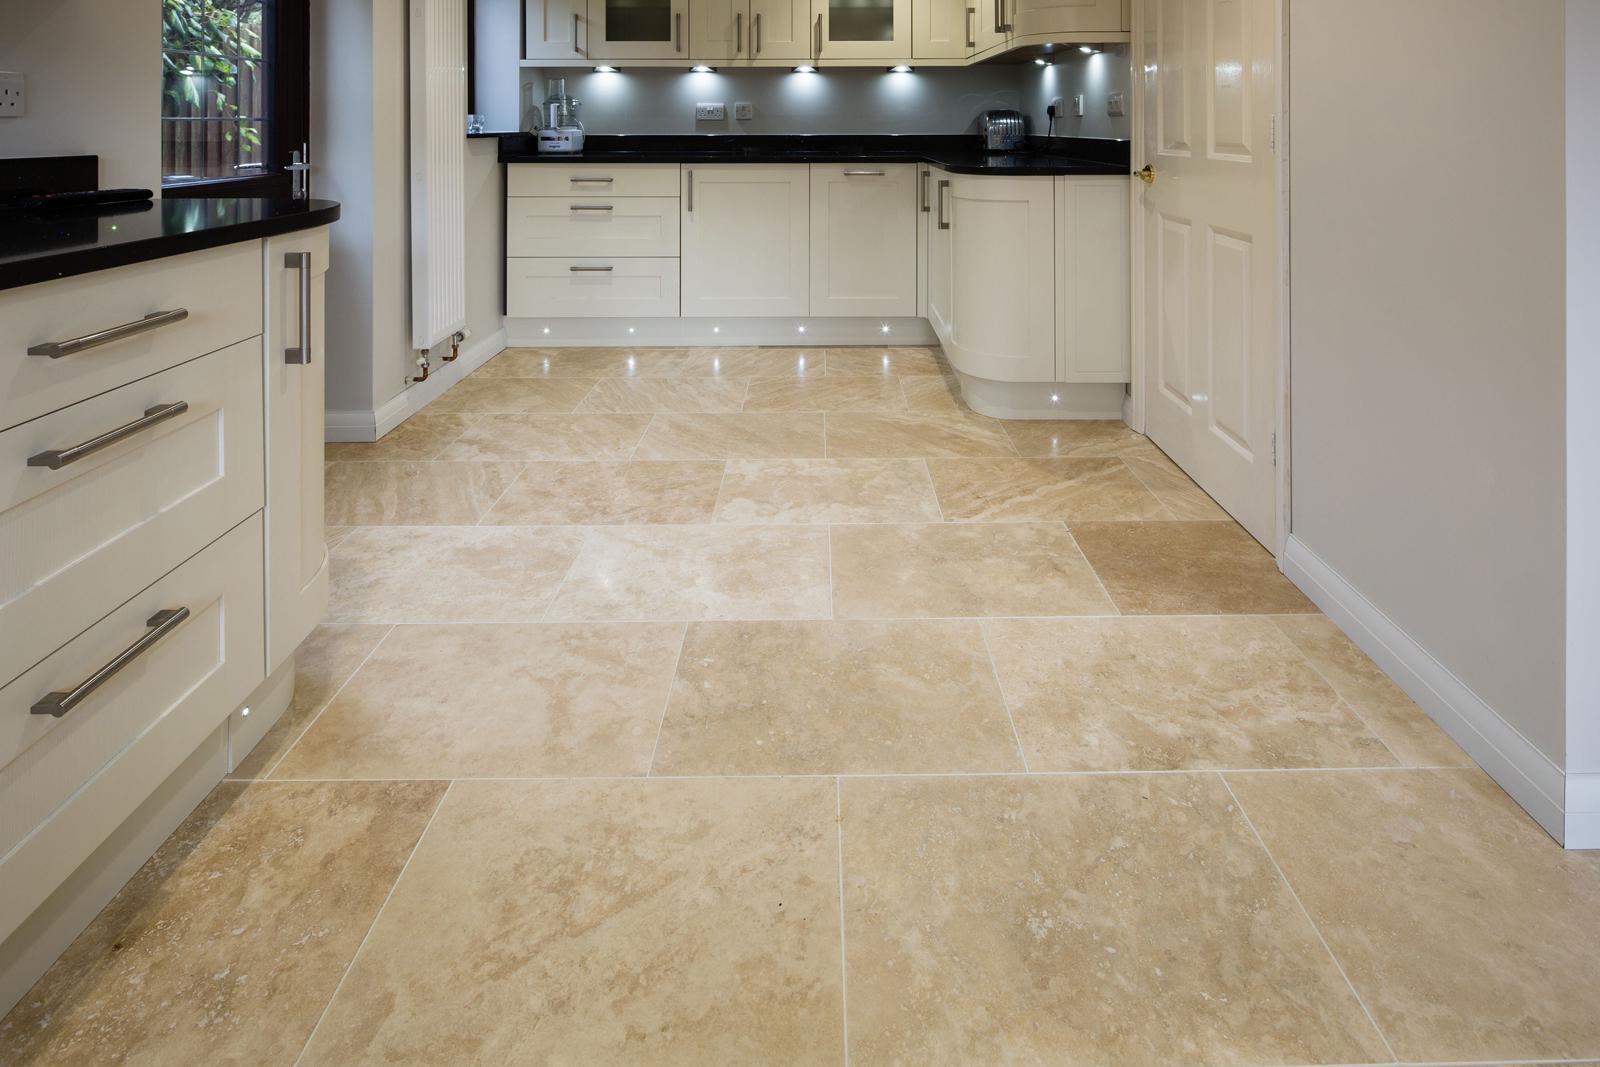 Ionian Honed & Filled Travertine Floor Tile